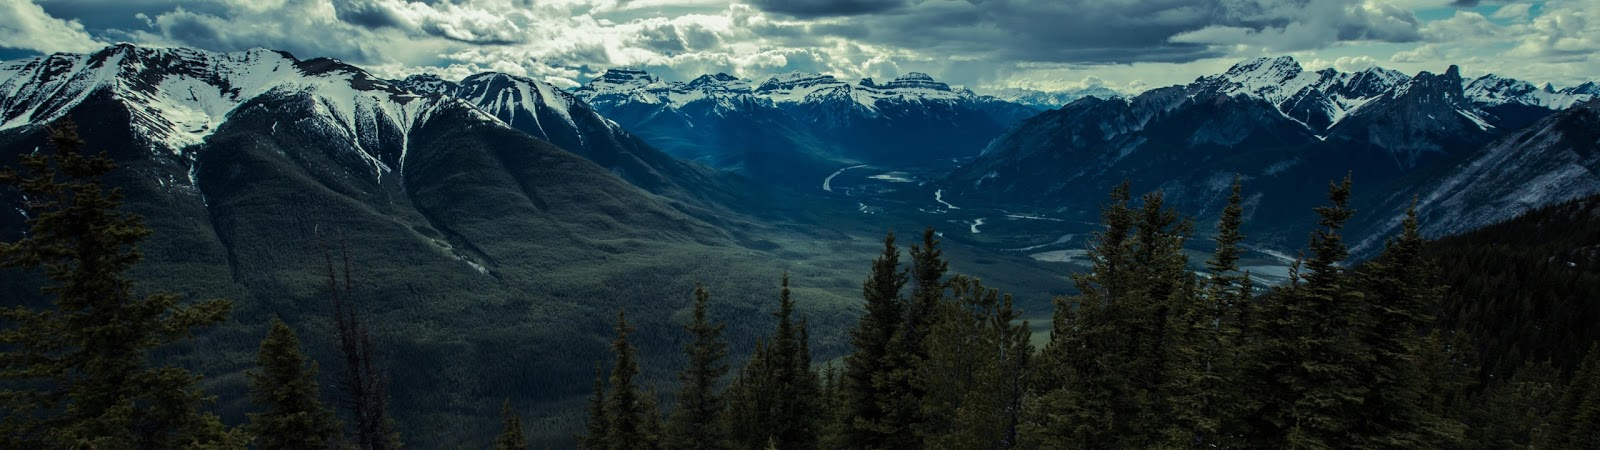 Banff National Park 3840 x 1080